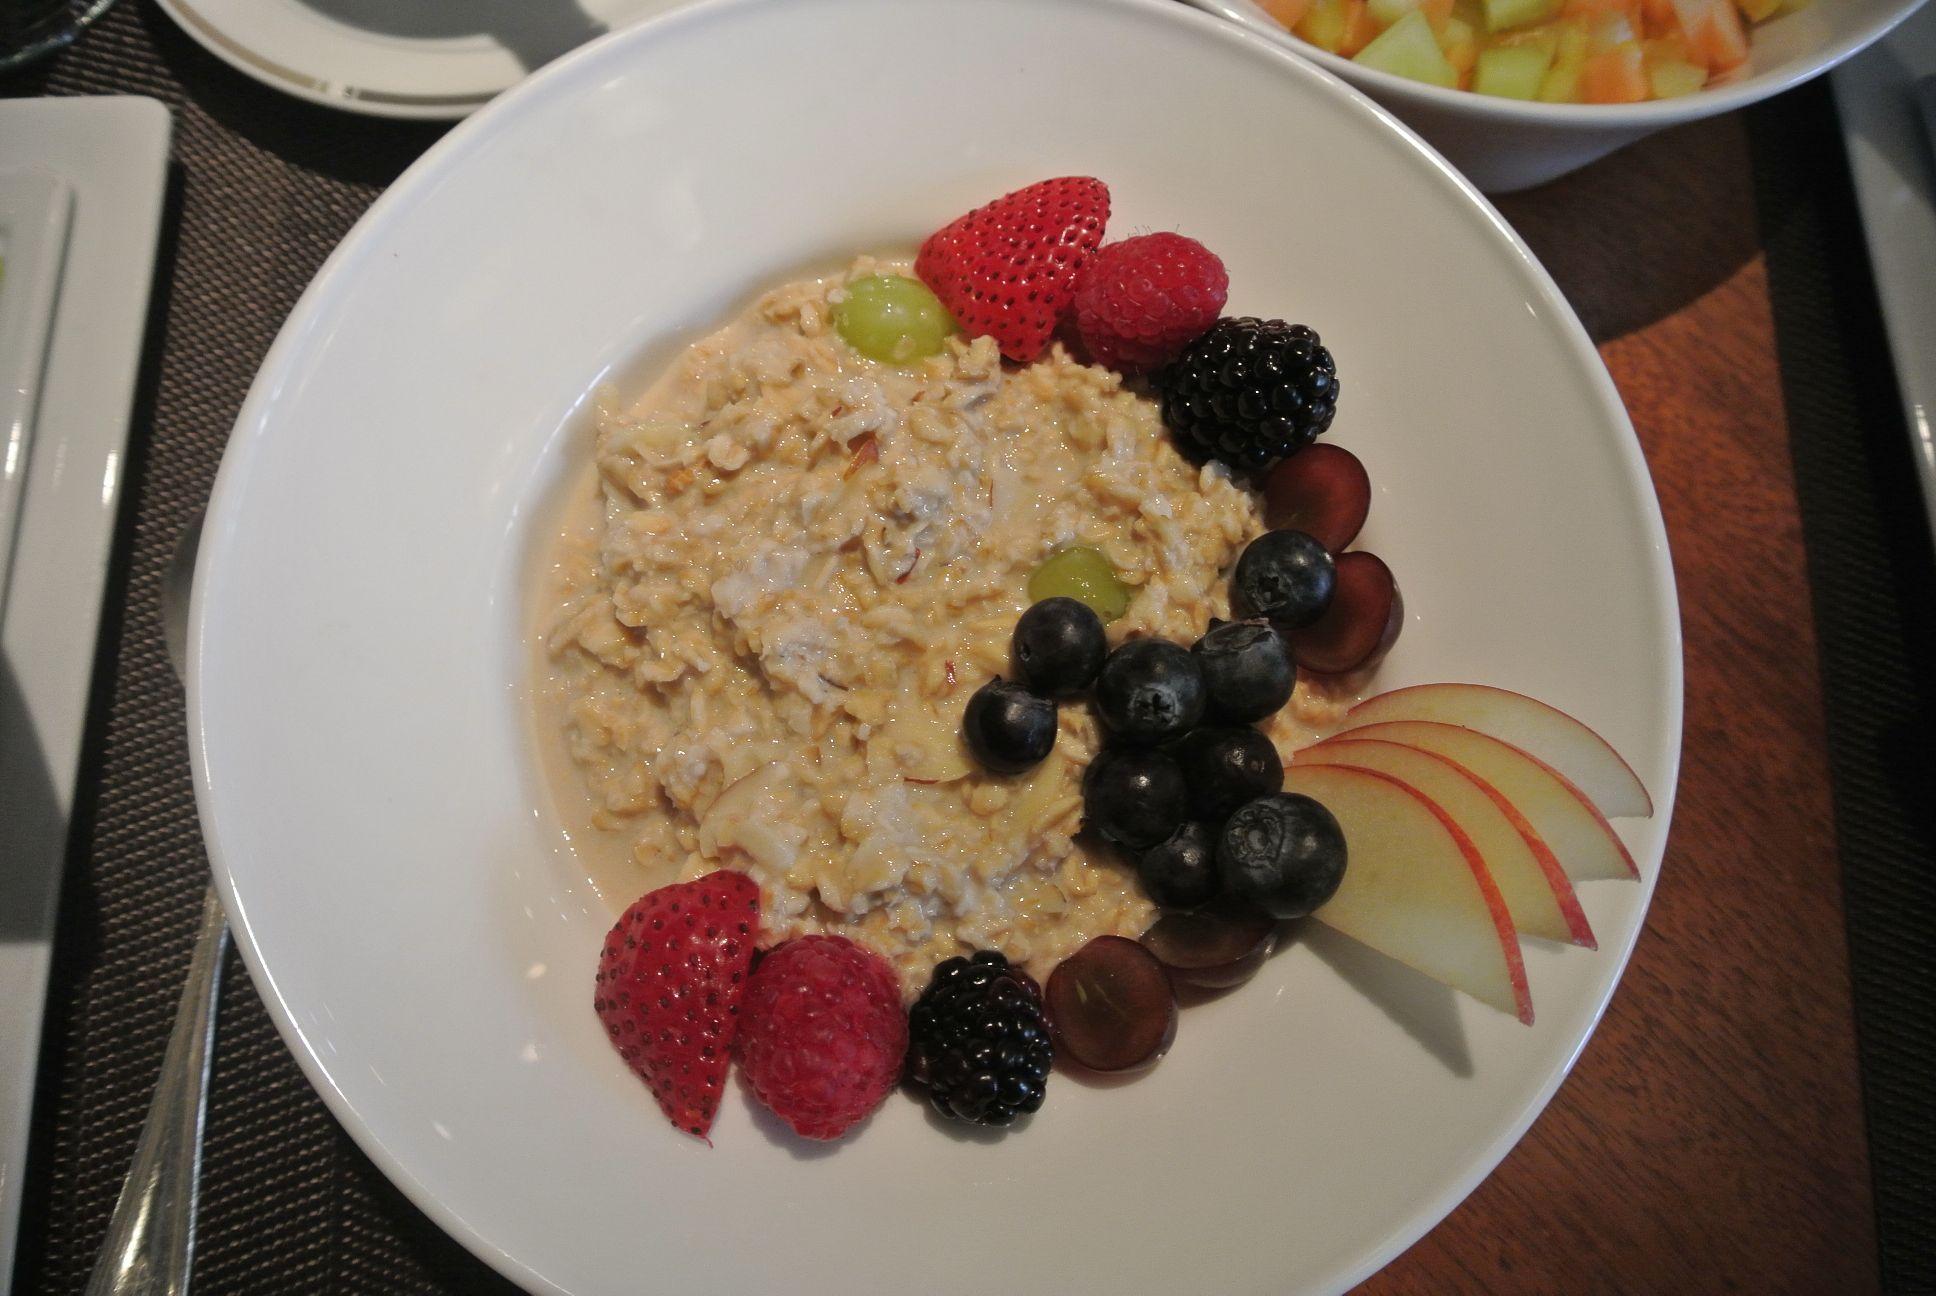 Swiss Bircher Muesli - Apples, Grapes, Yoghurt, Honey, Oats